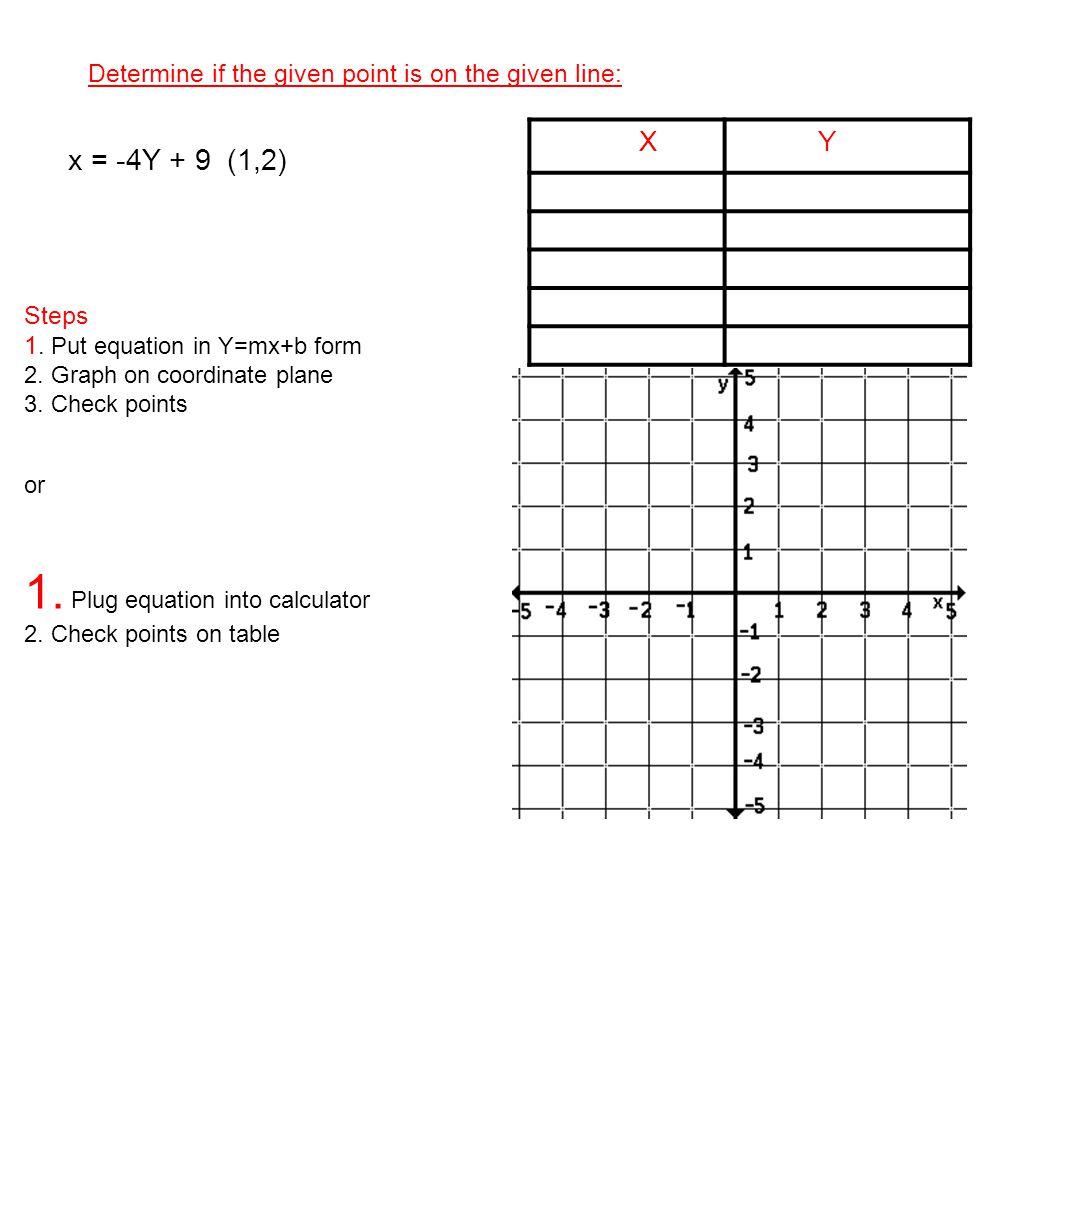 1. Plug equation into calculator